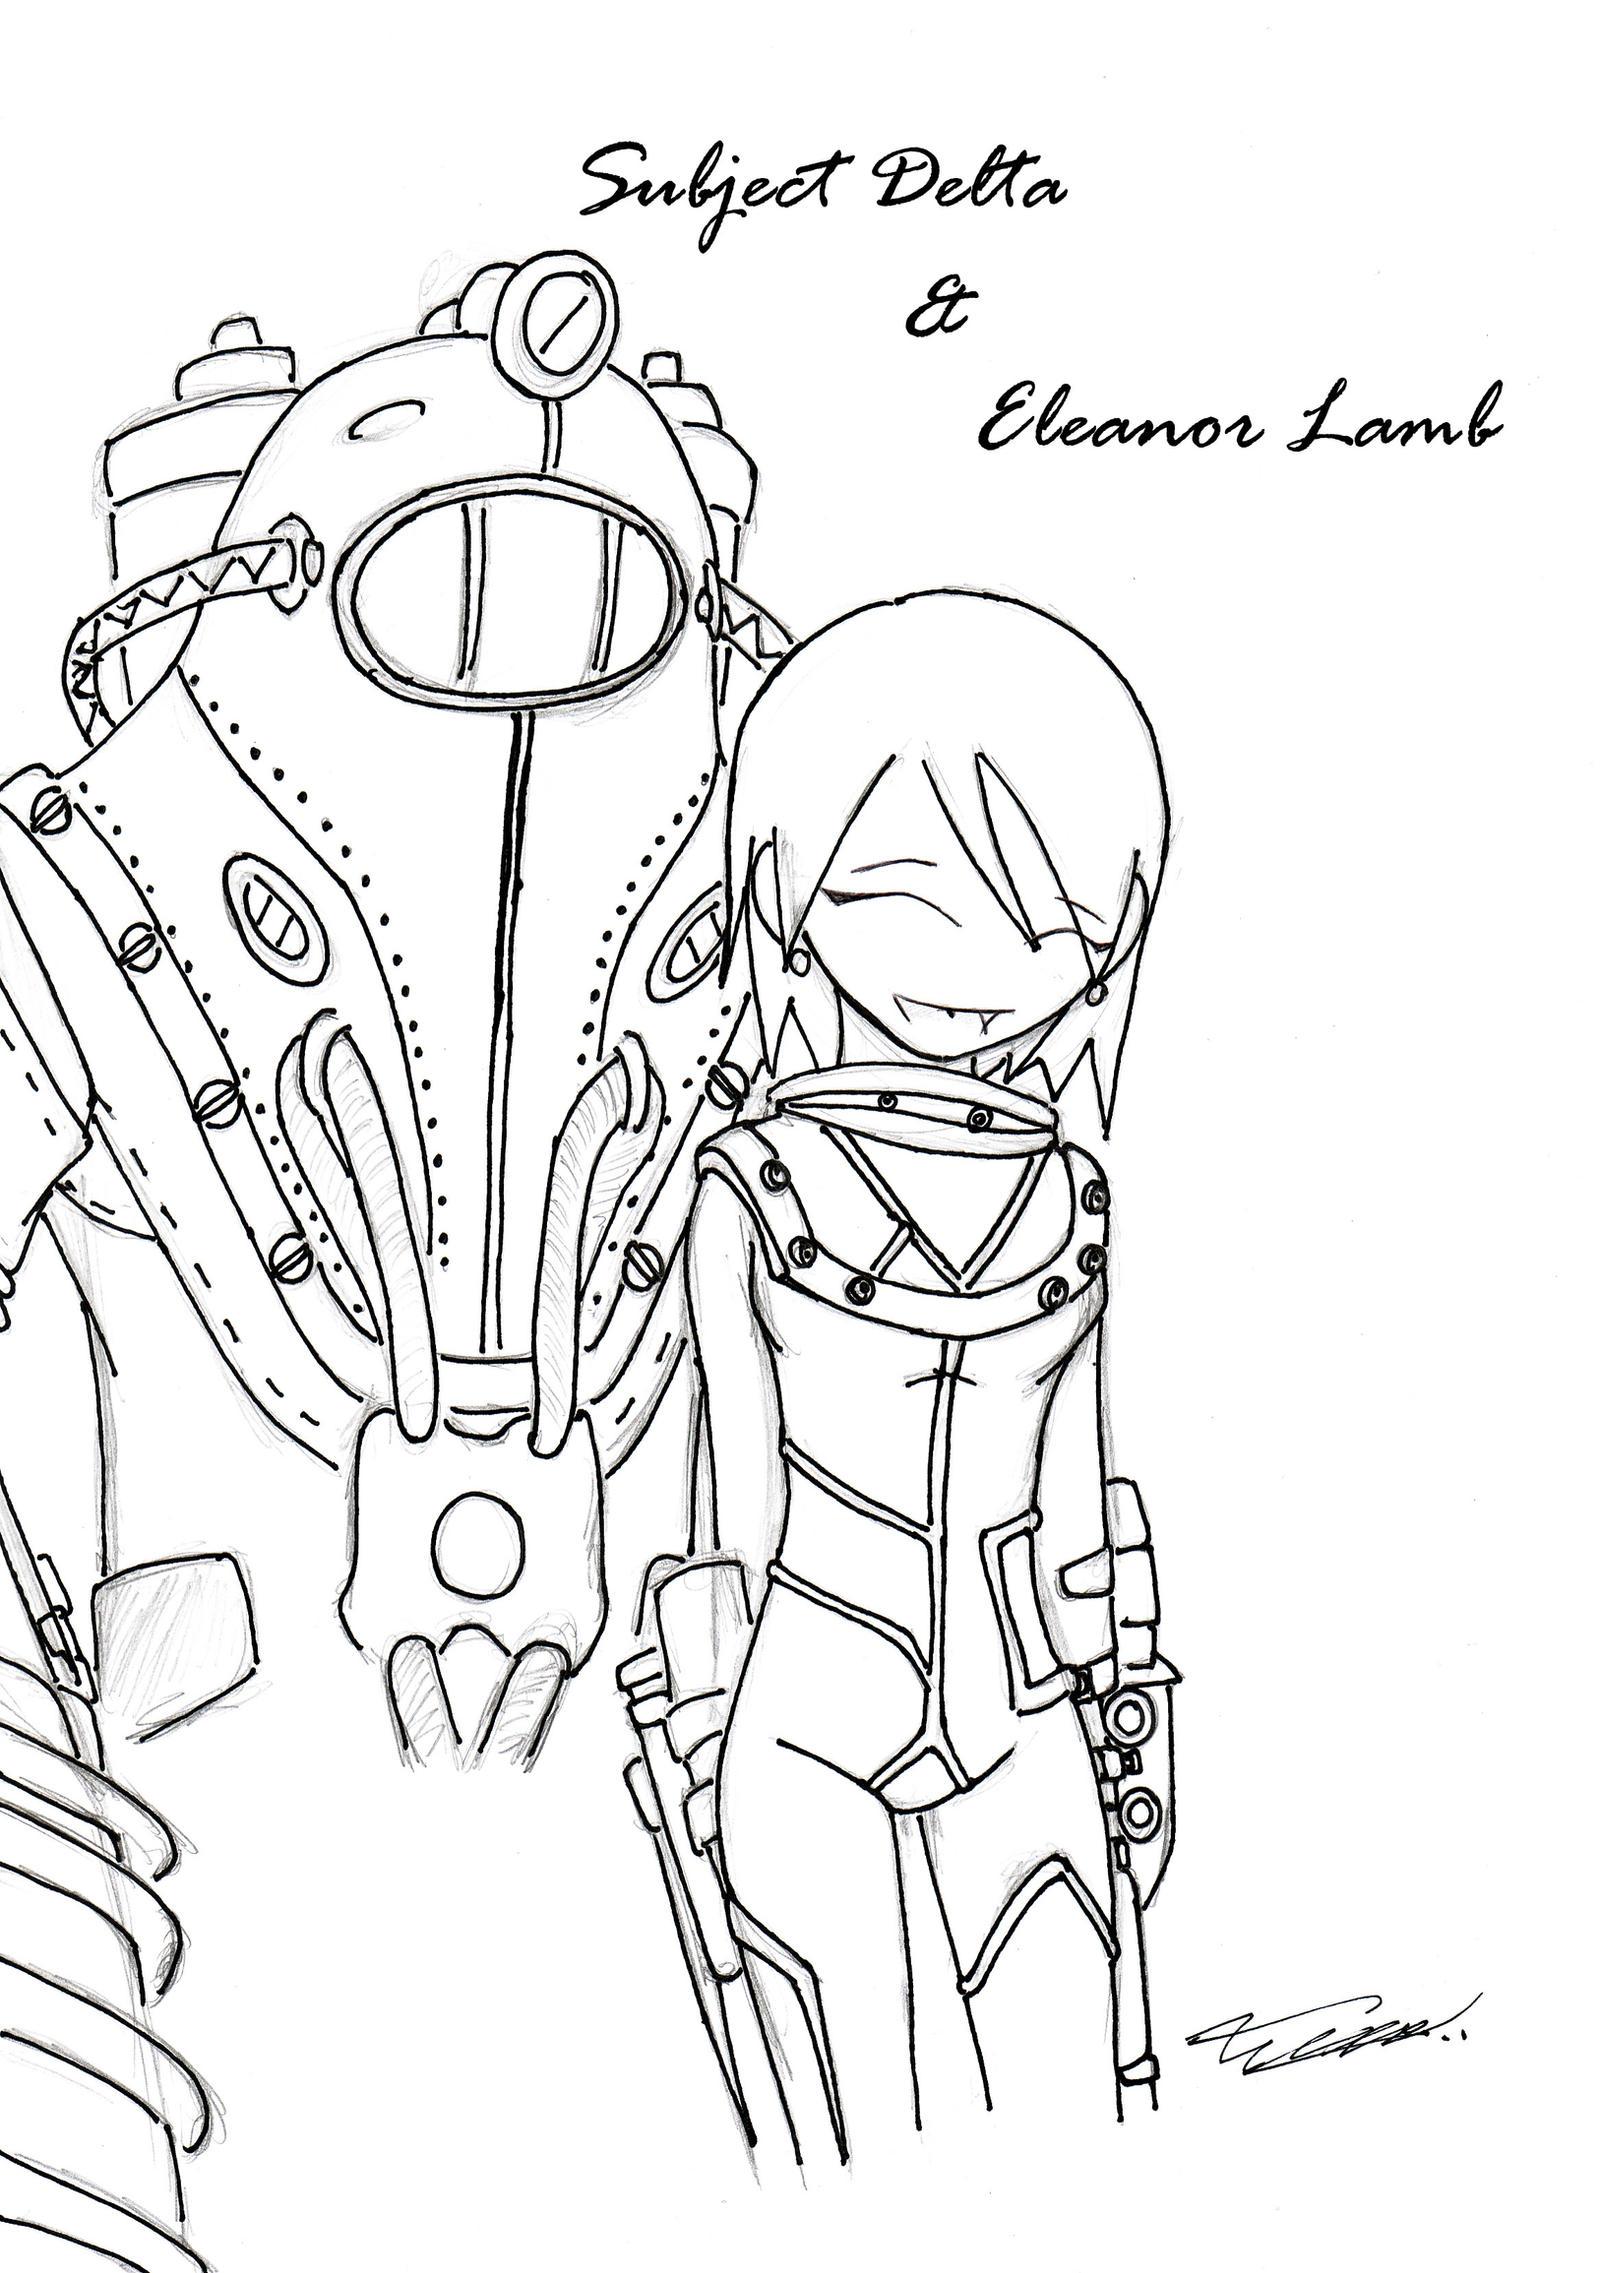 Subject Delta and Eleanor Lamb by DarkR08Bioshock 2 Eleanor And Delta